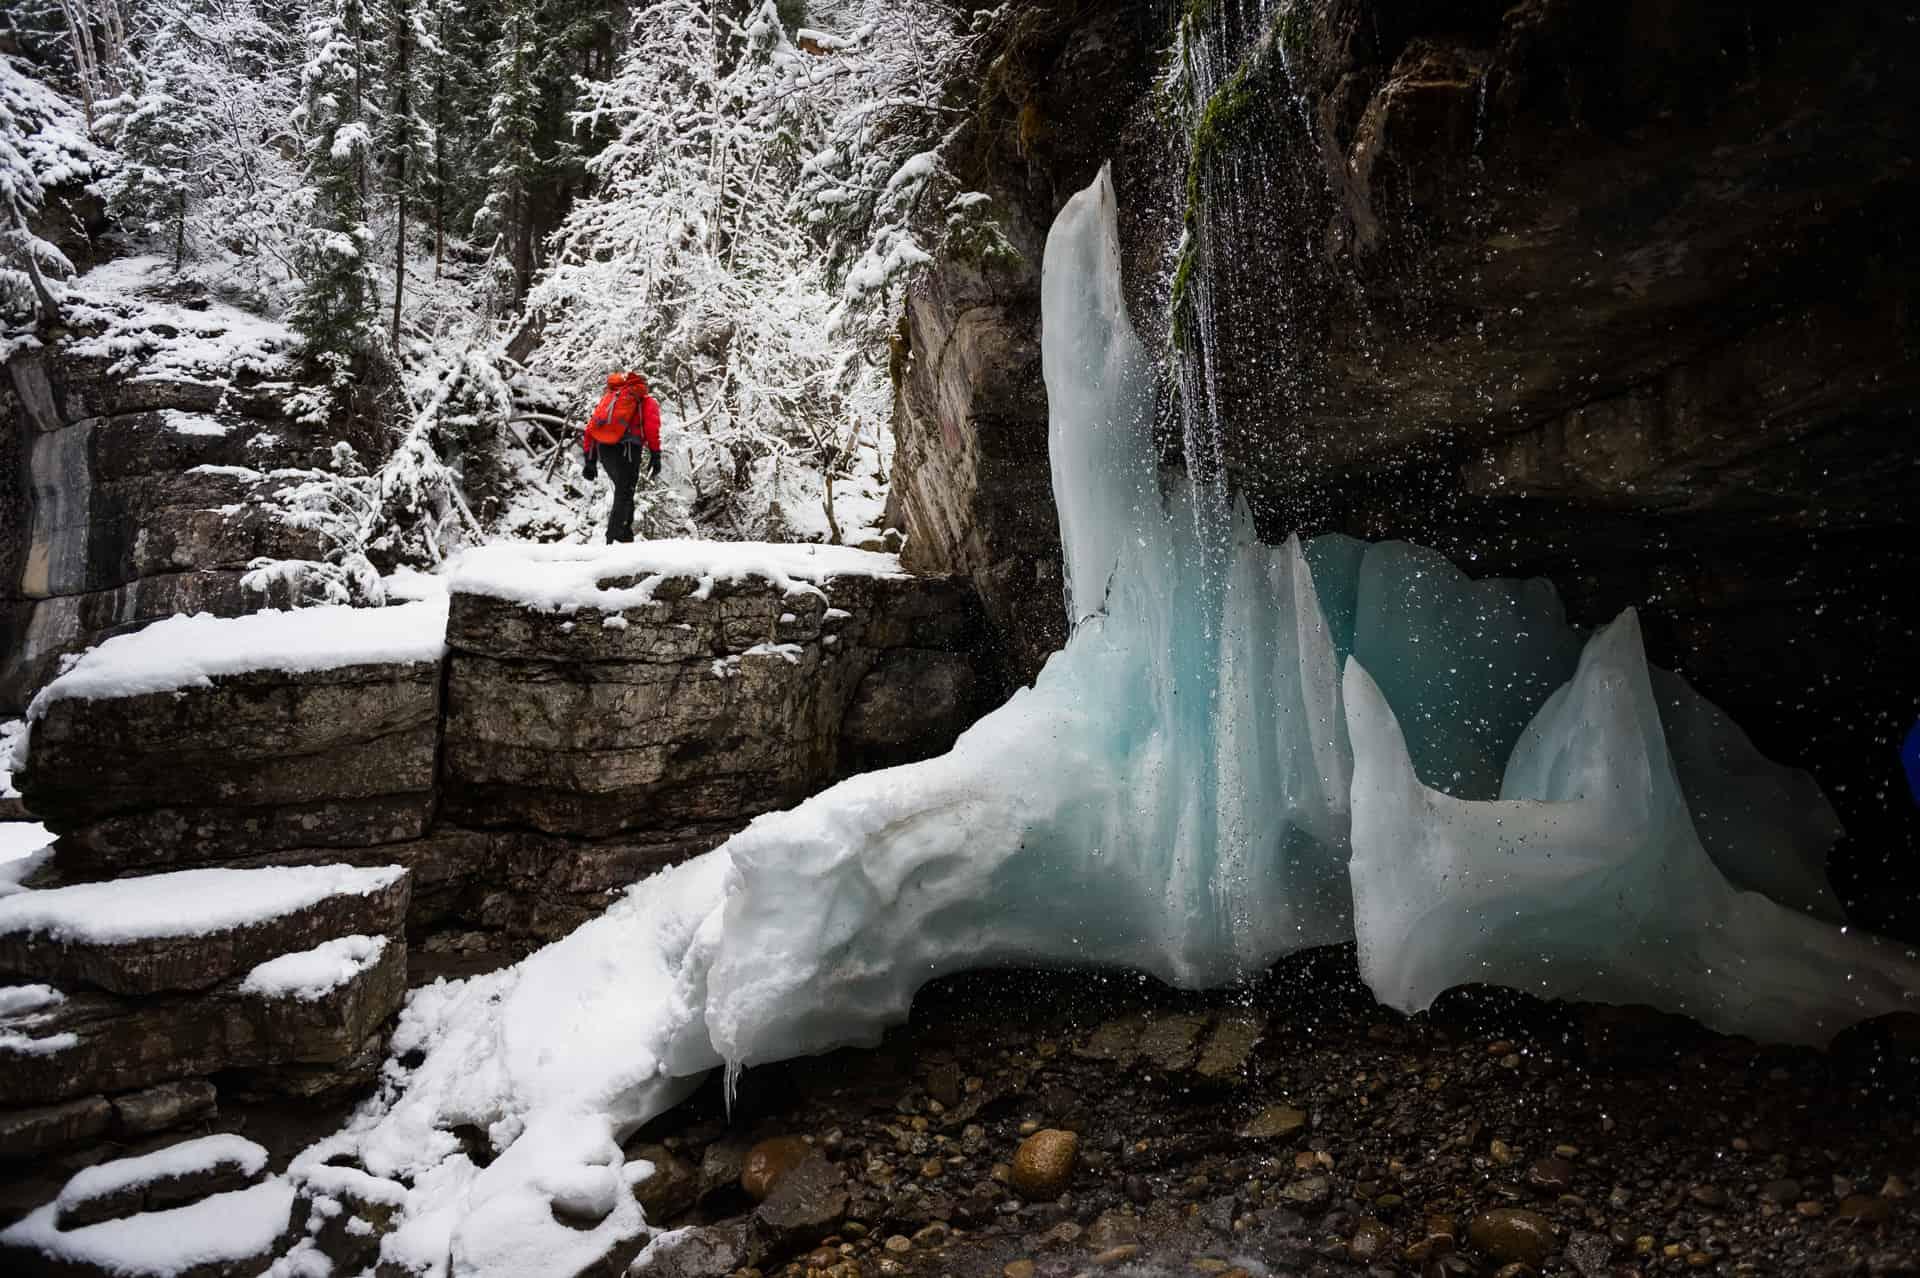 5 Kid-Friendly Magical Winter Hikes for Exploring Alberta